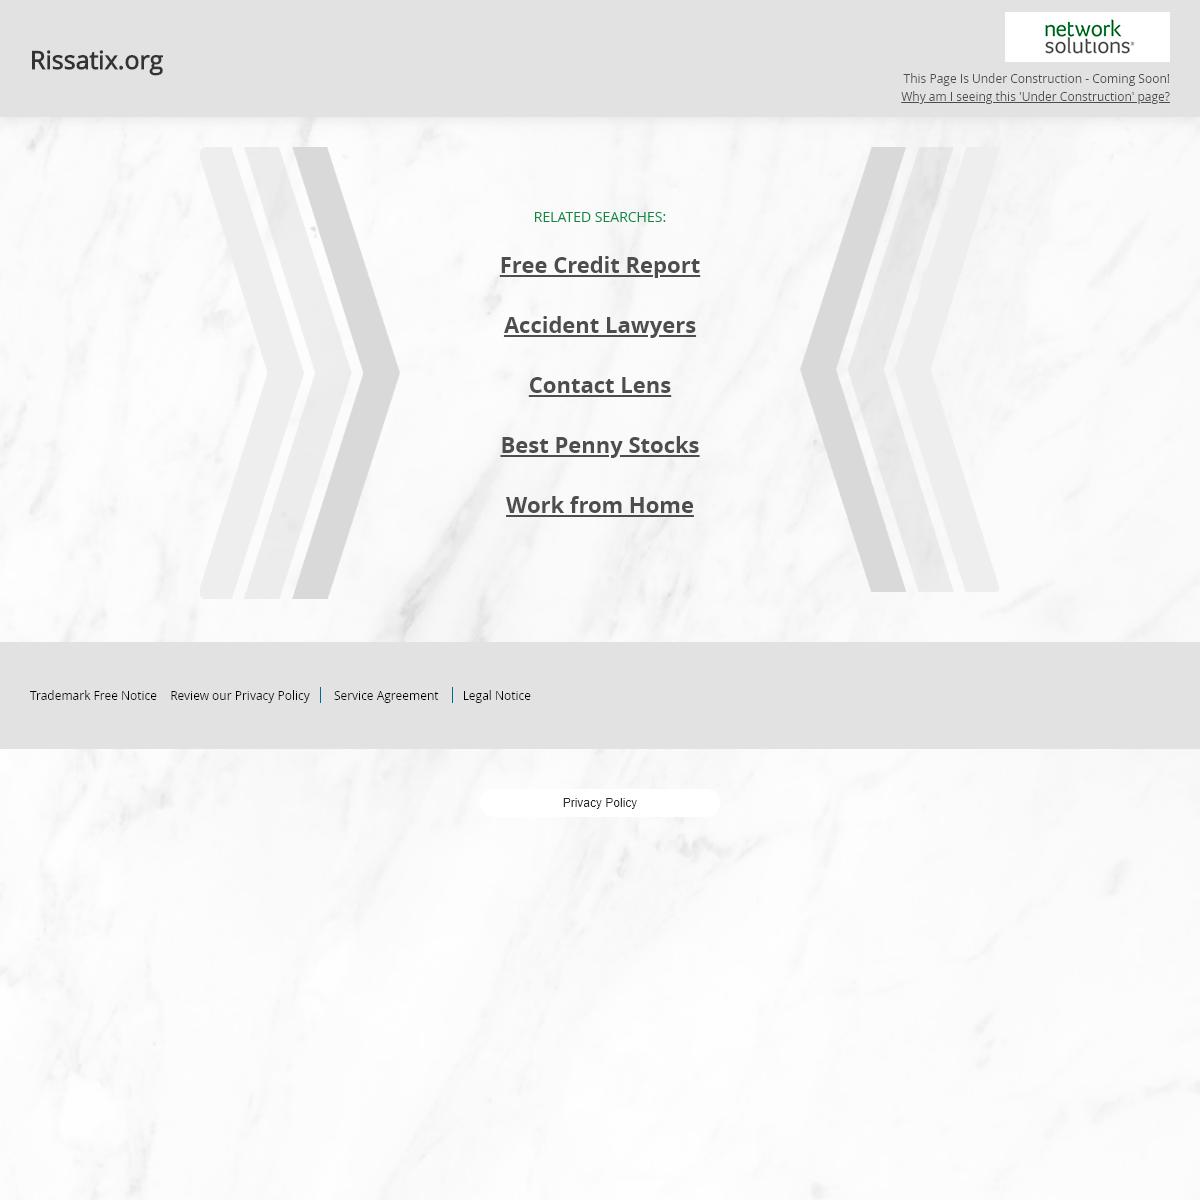 Rissatix.org